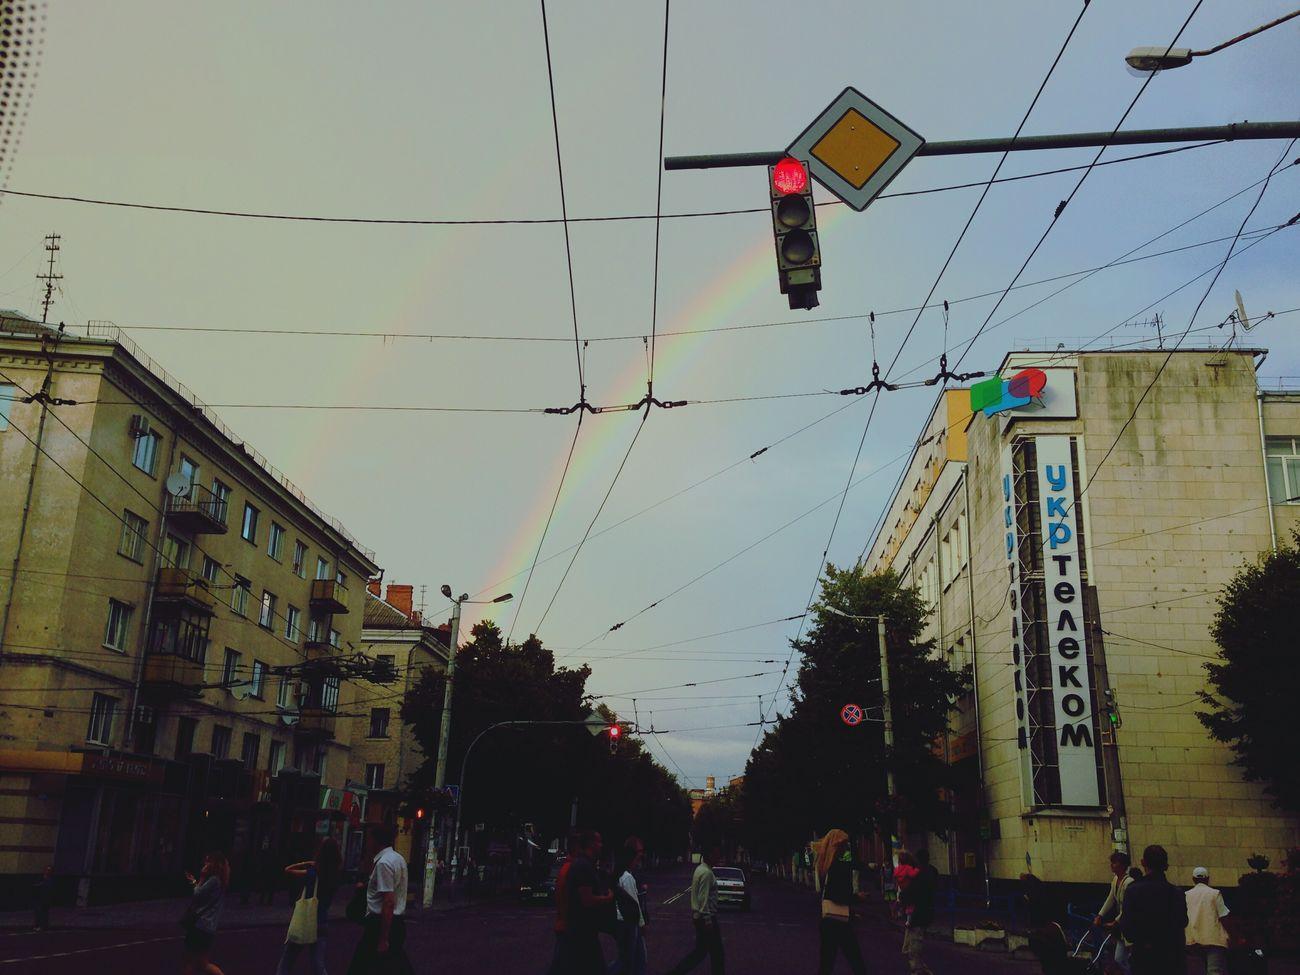 Streets Belog To Me